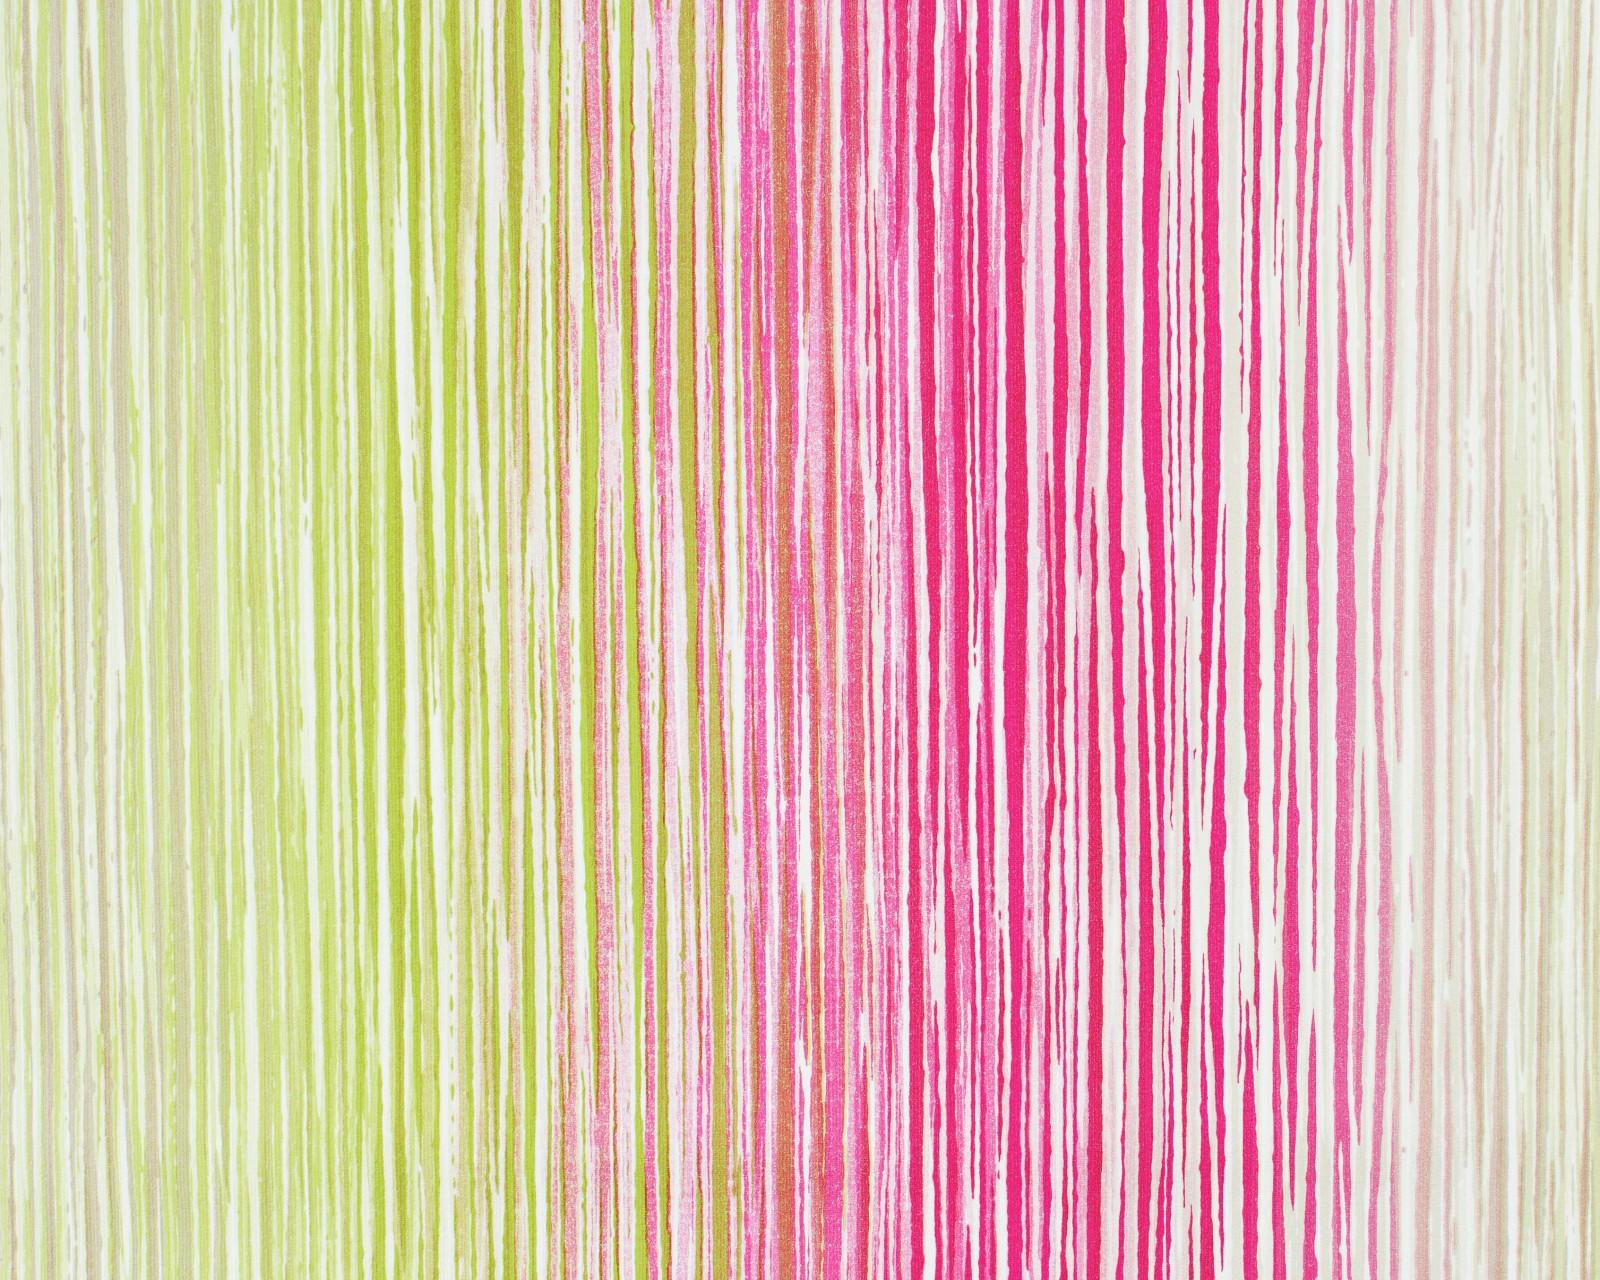 vliestapete esprit home streifen gr n pink 94147 1. Black Bedroom Furniture Sets. Home Design Ideas